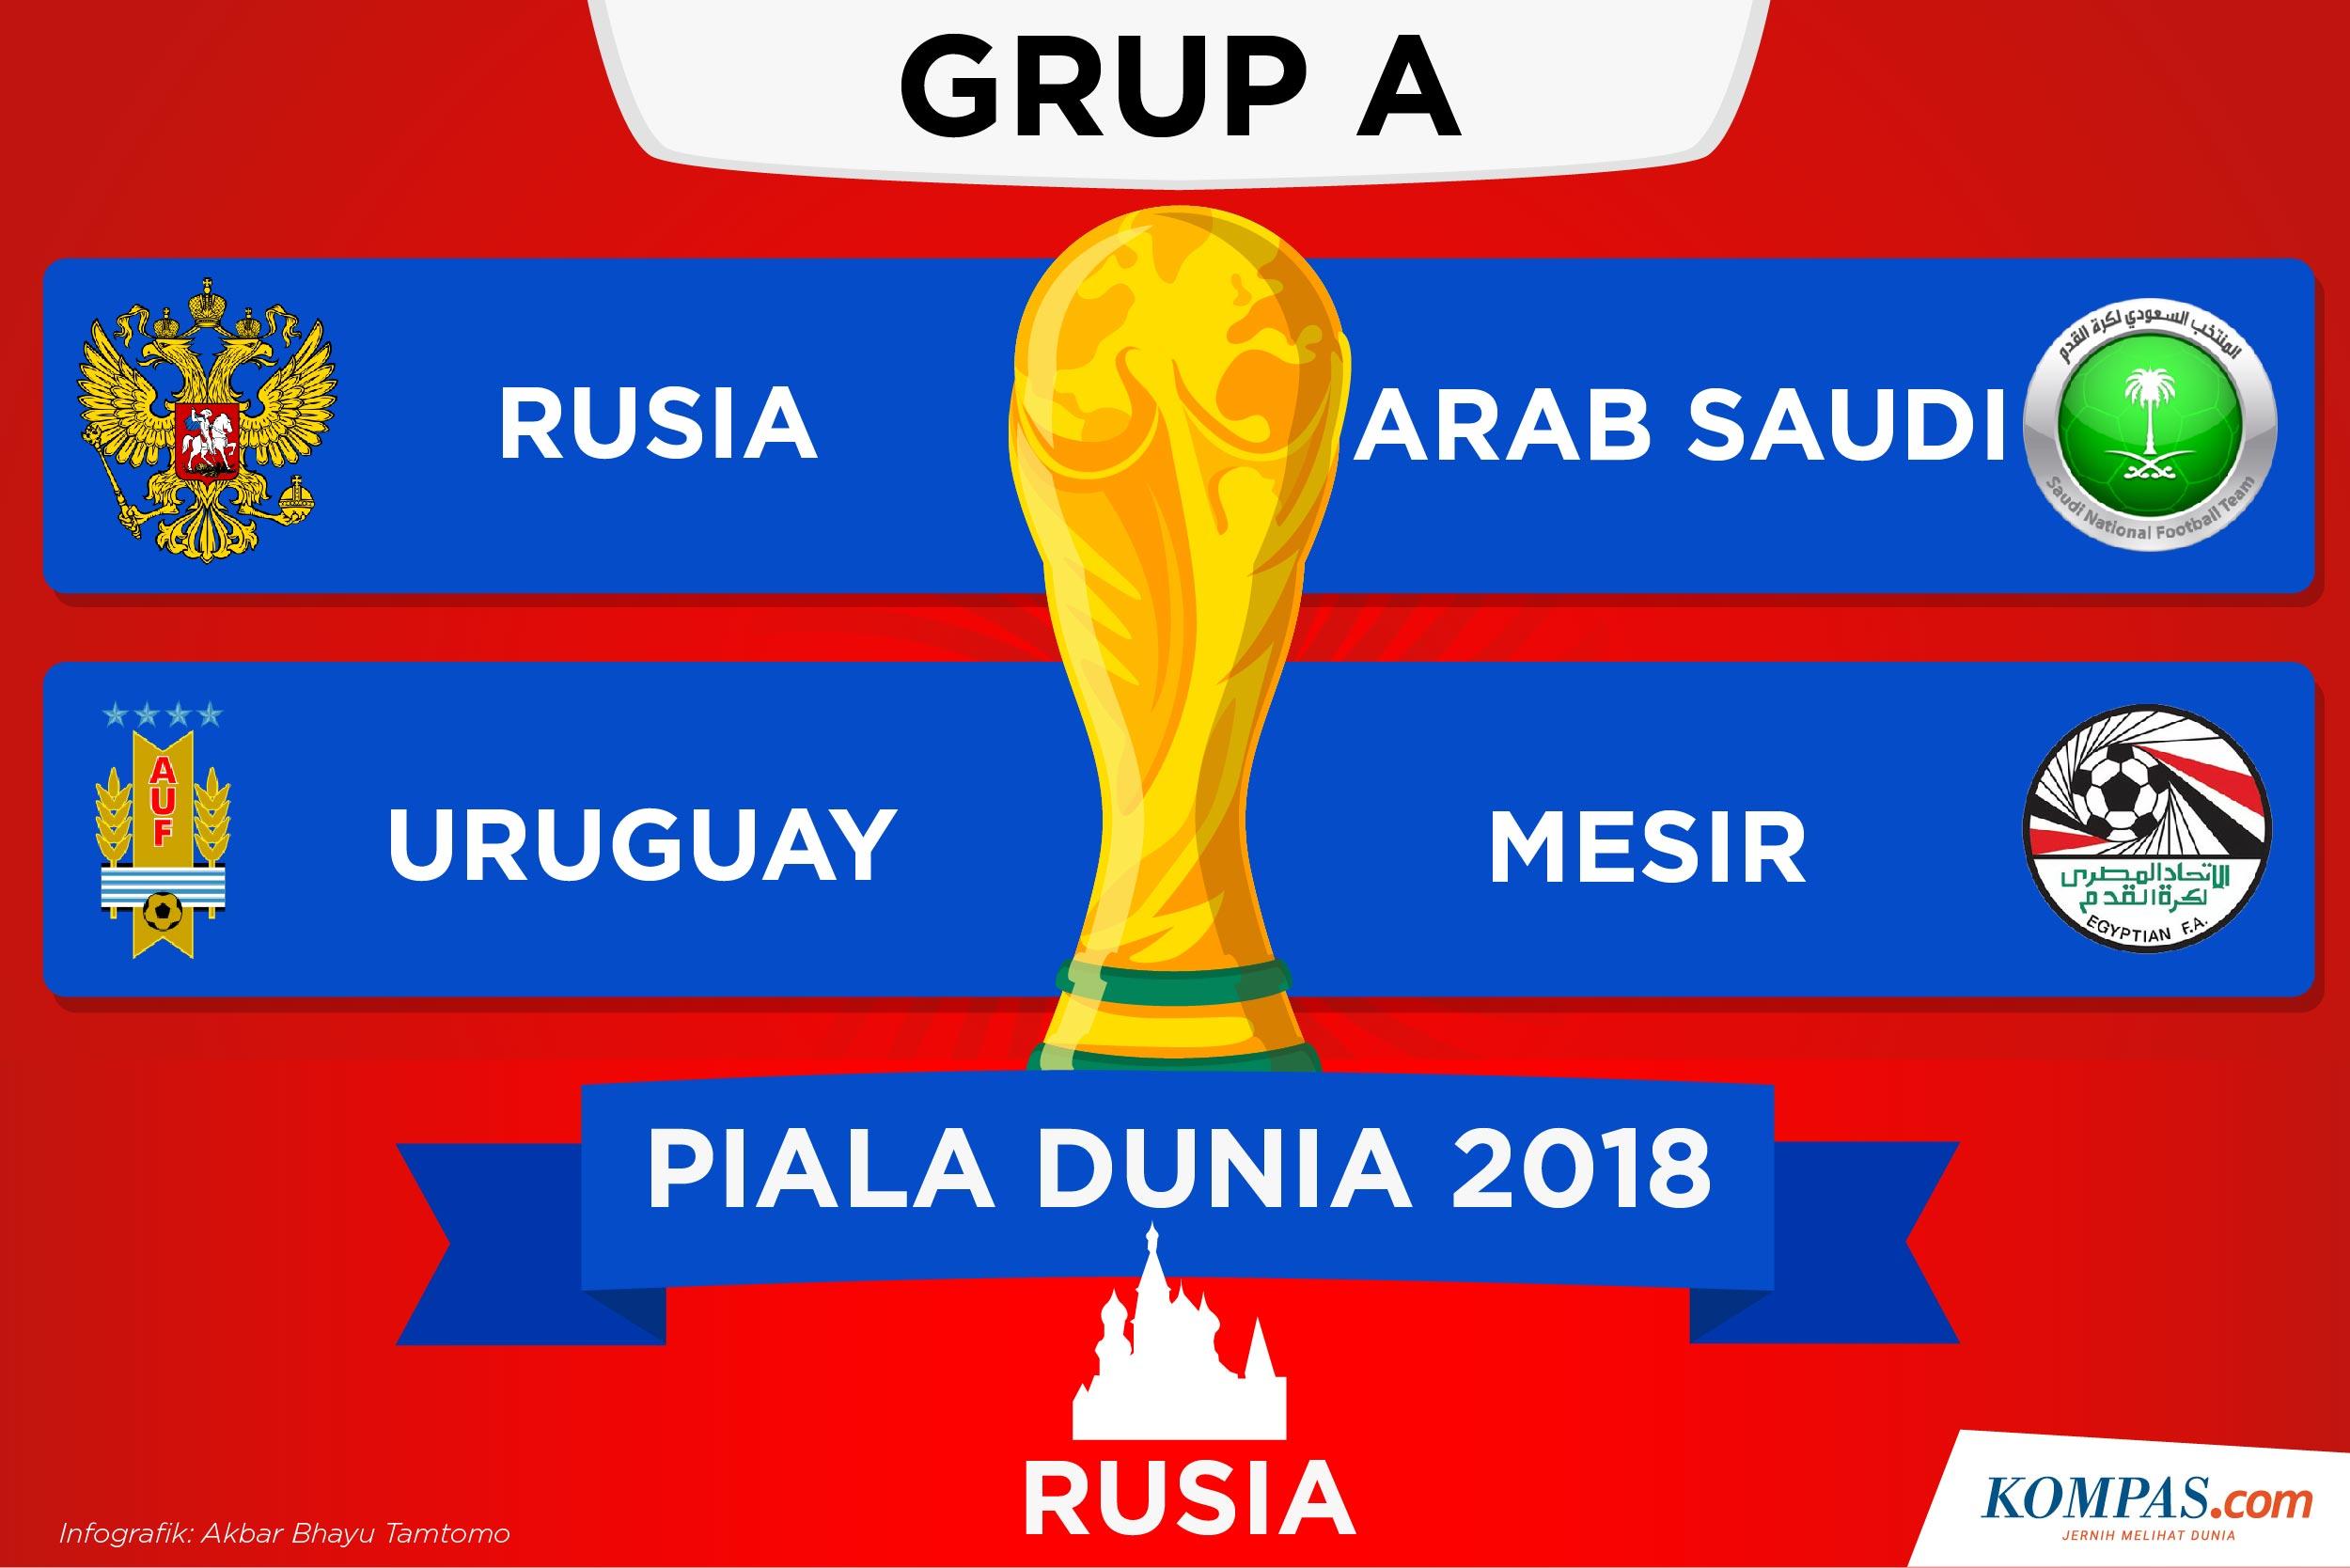 KOMPAS.com/Akbar Bhayu Tamtomo Grup A Piala Dunia 2018 Rusia